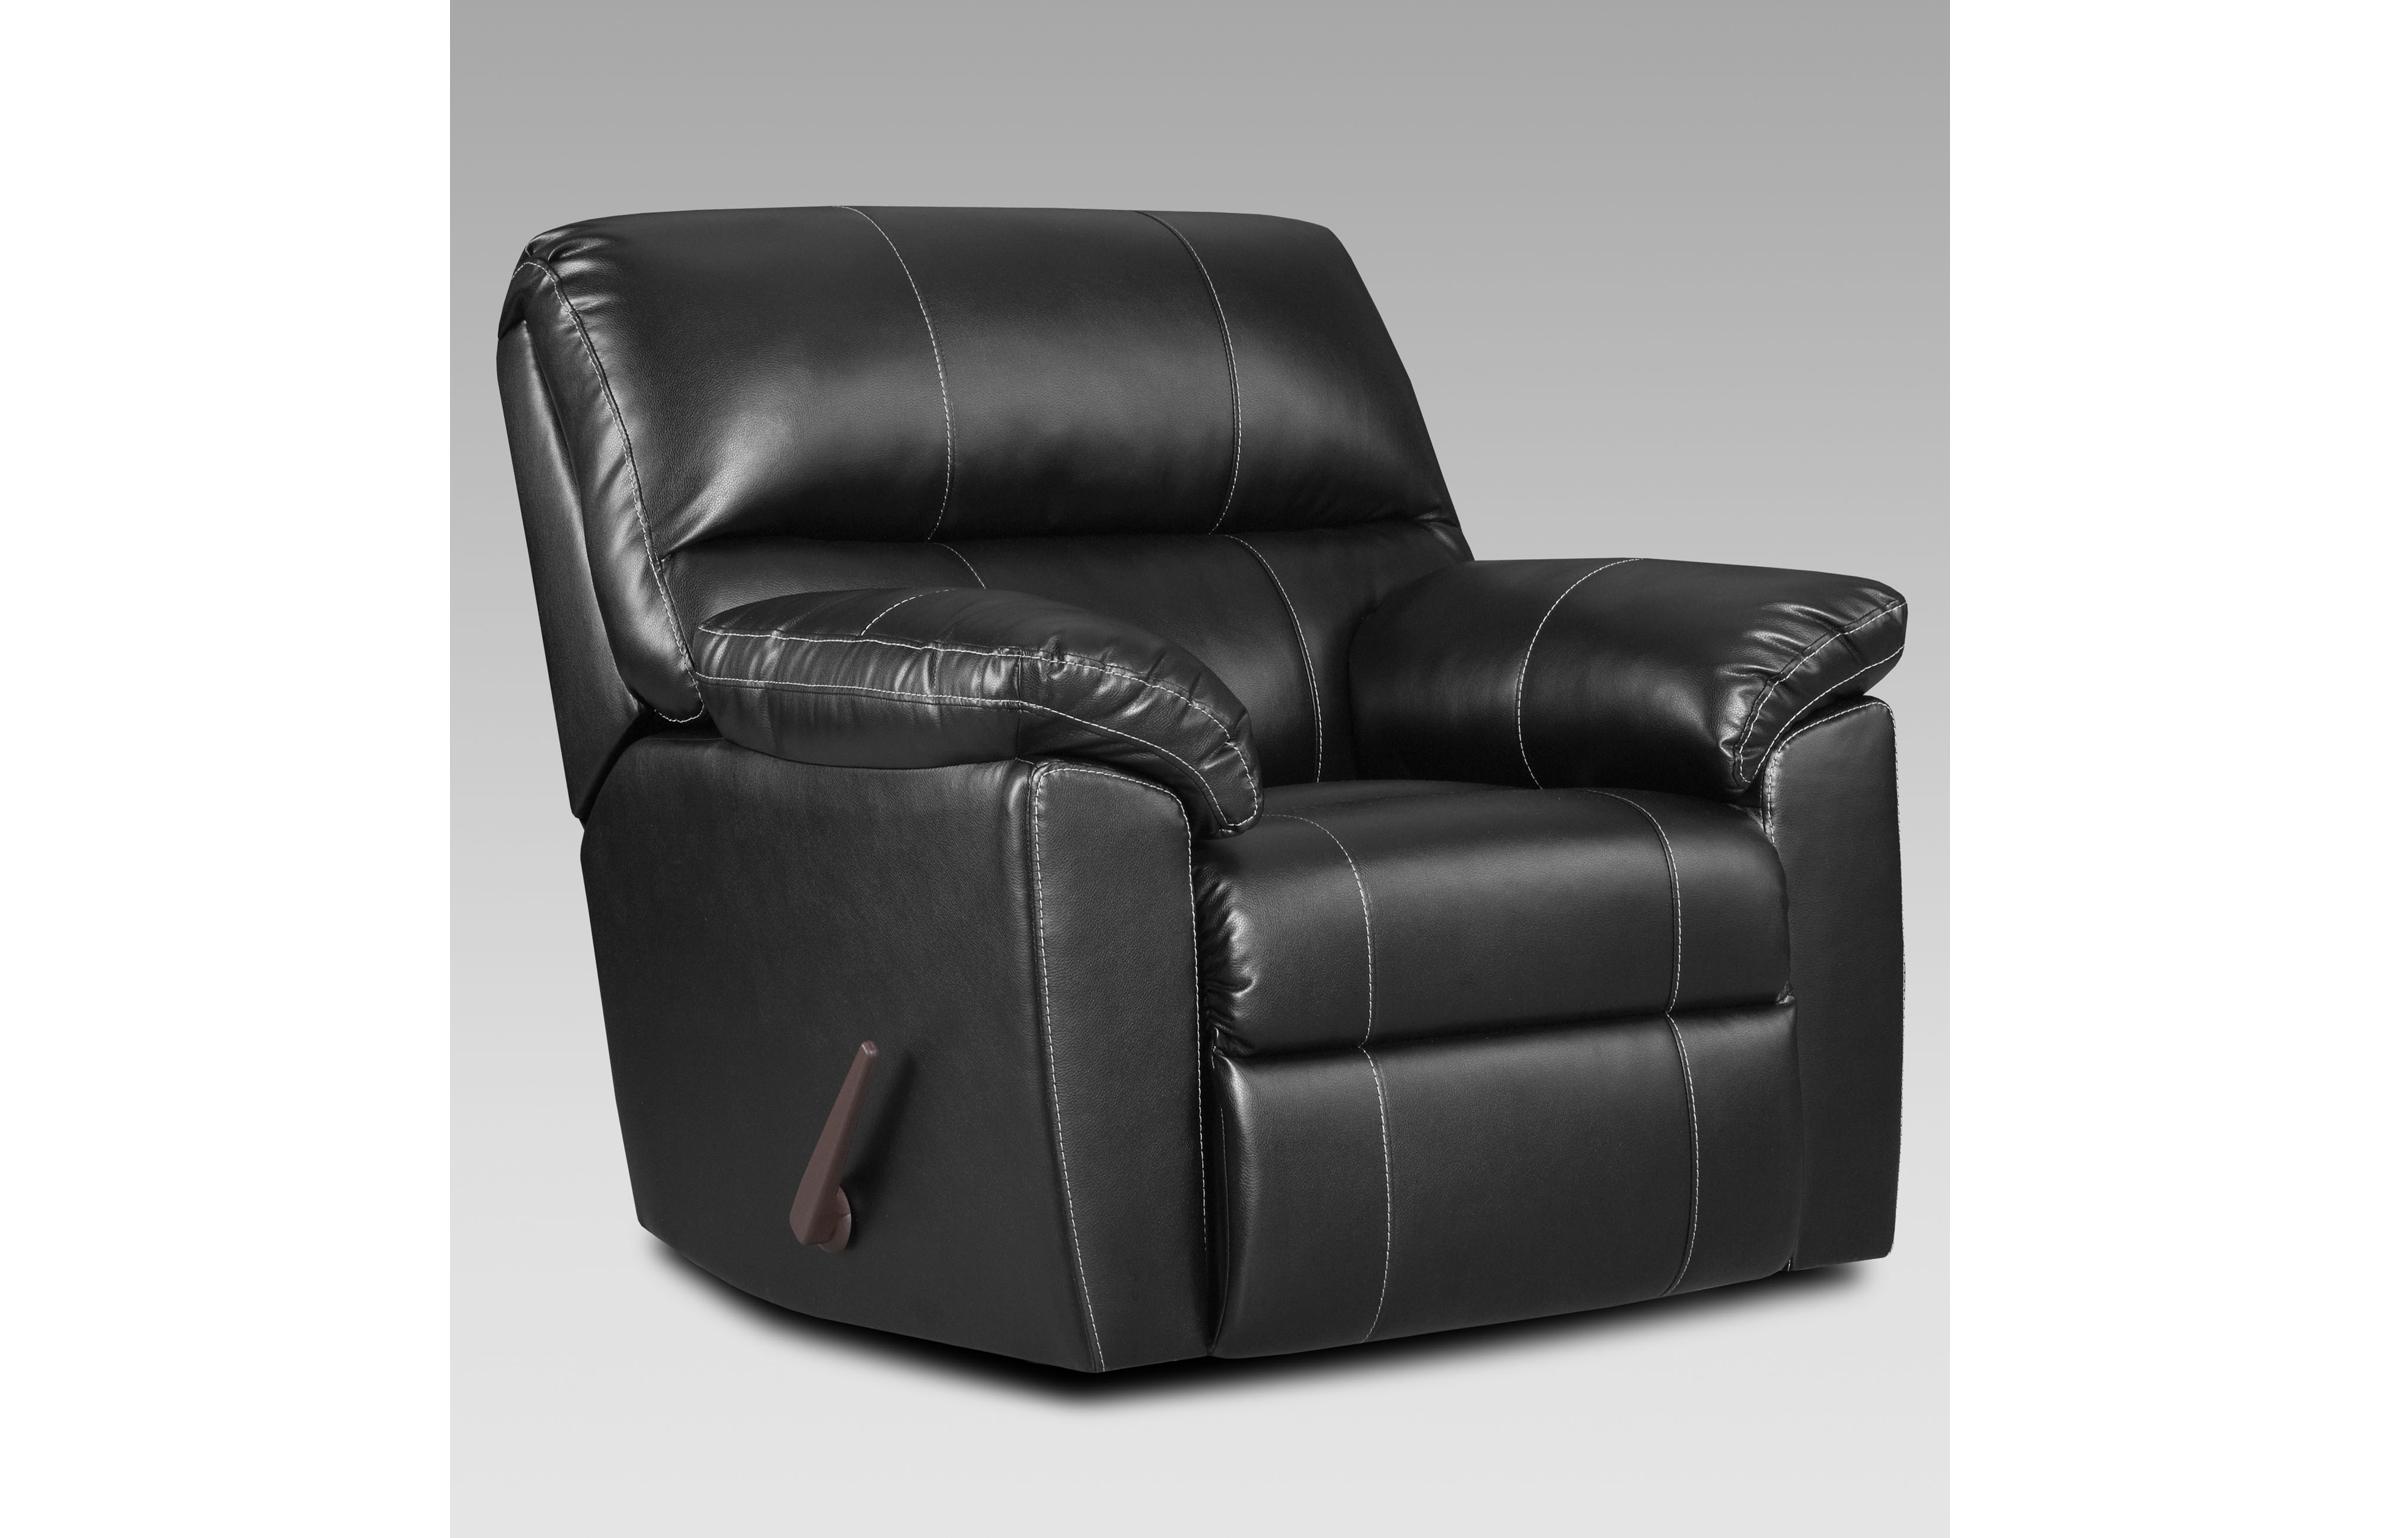 MAF2450 Austin Black